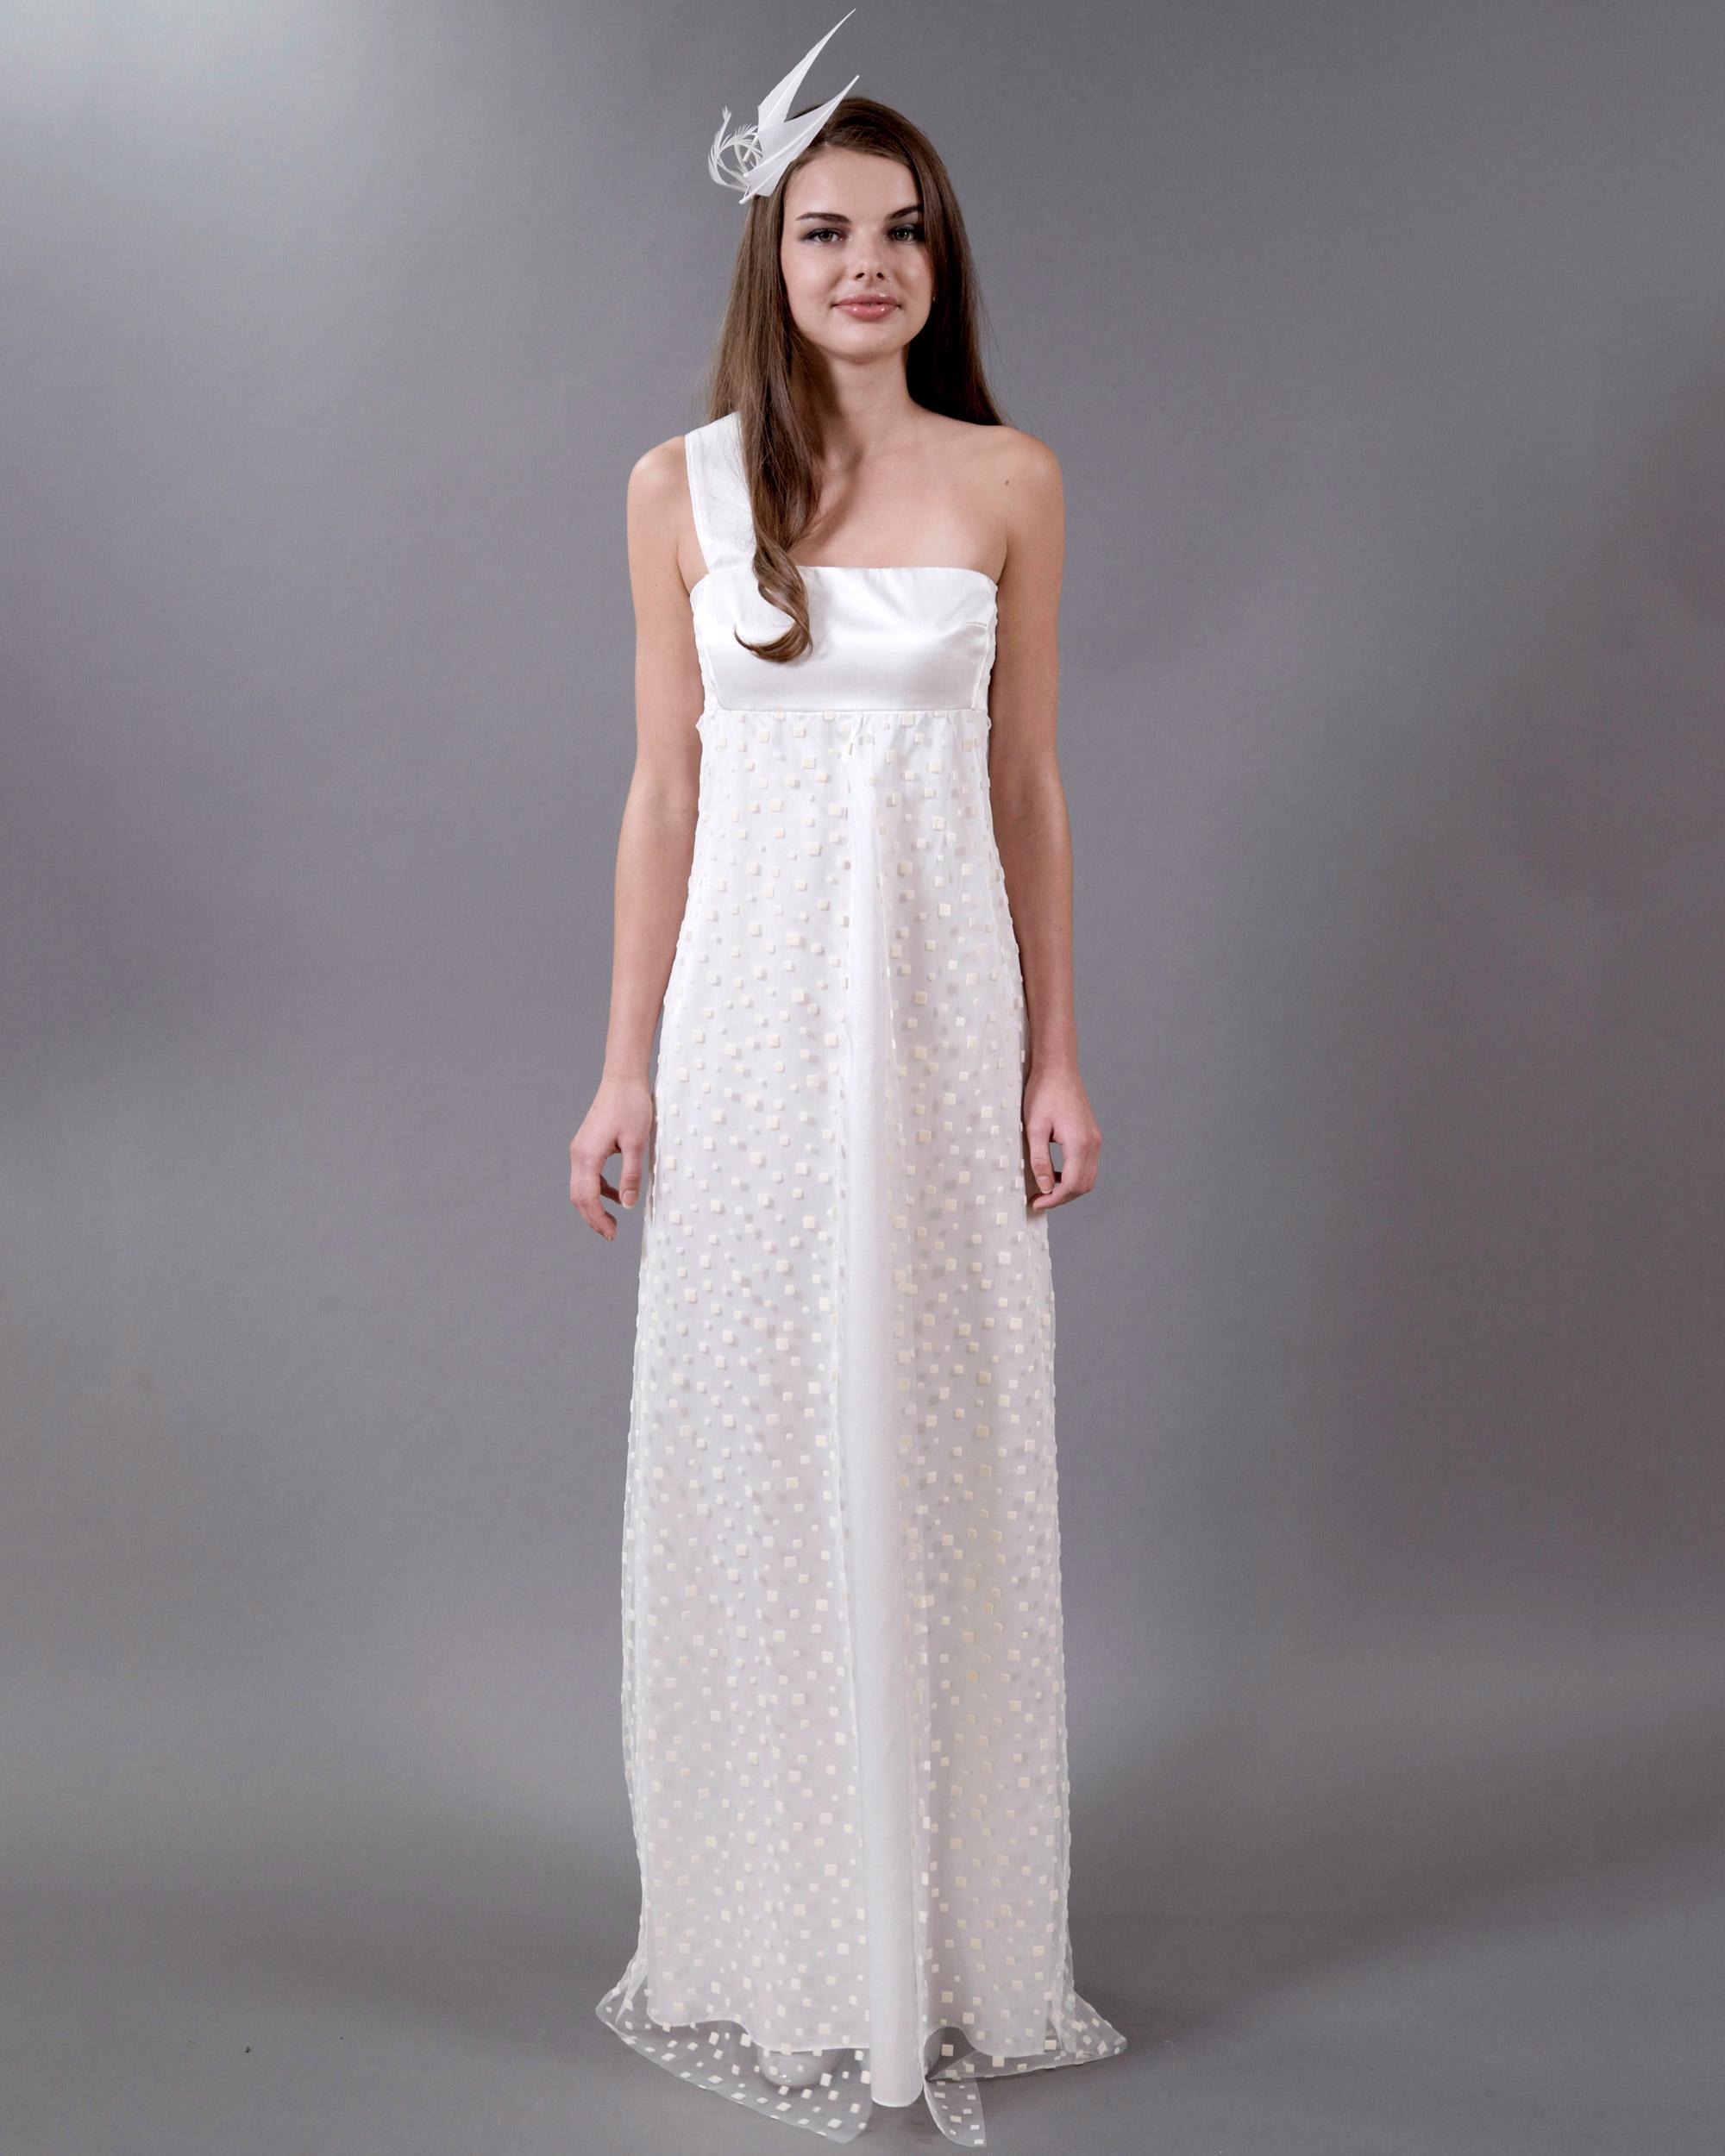 iconic-dresses-57-grand.jpg